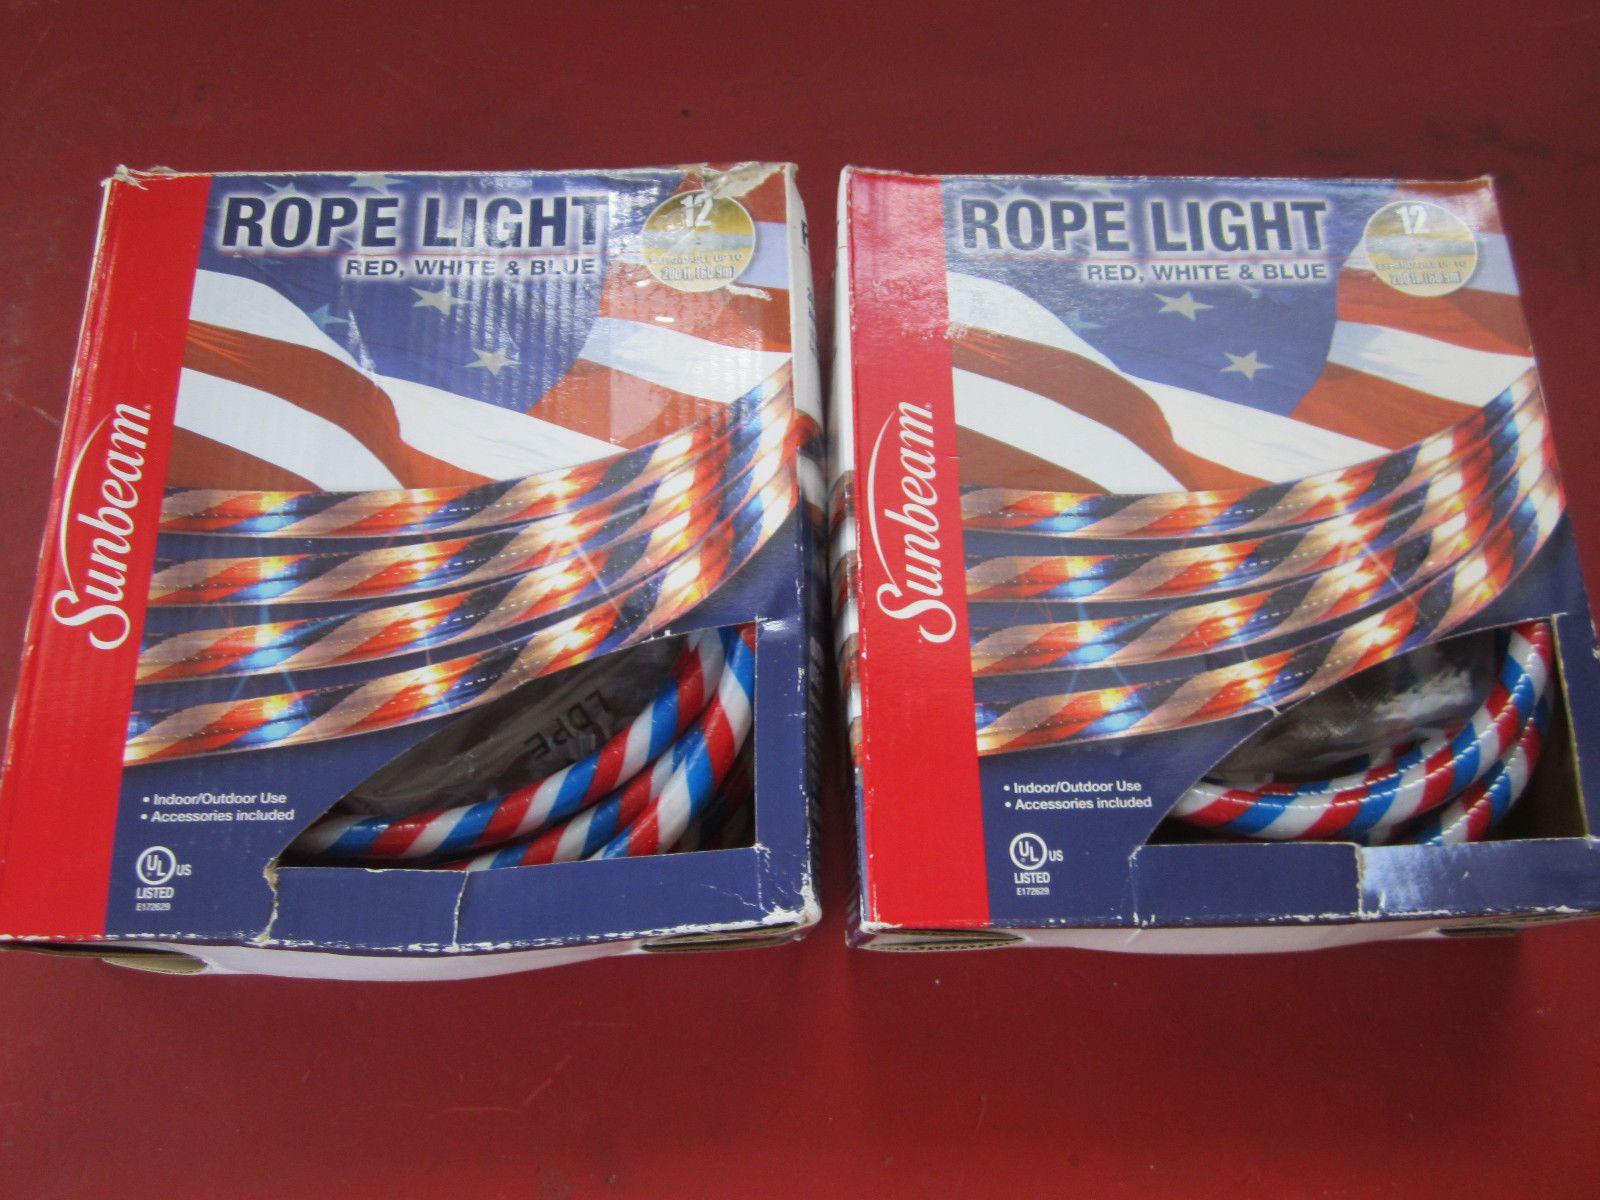 Sunbeam lot of 2 red white blue rope lights 12 feet 4th of july sunbeam lot of 2 red white blue rope lights 12 feet 4th of july patriotic lights aloadofball Gallery